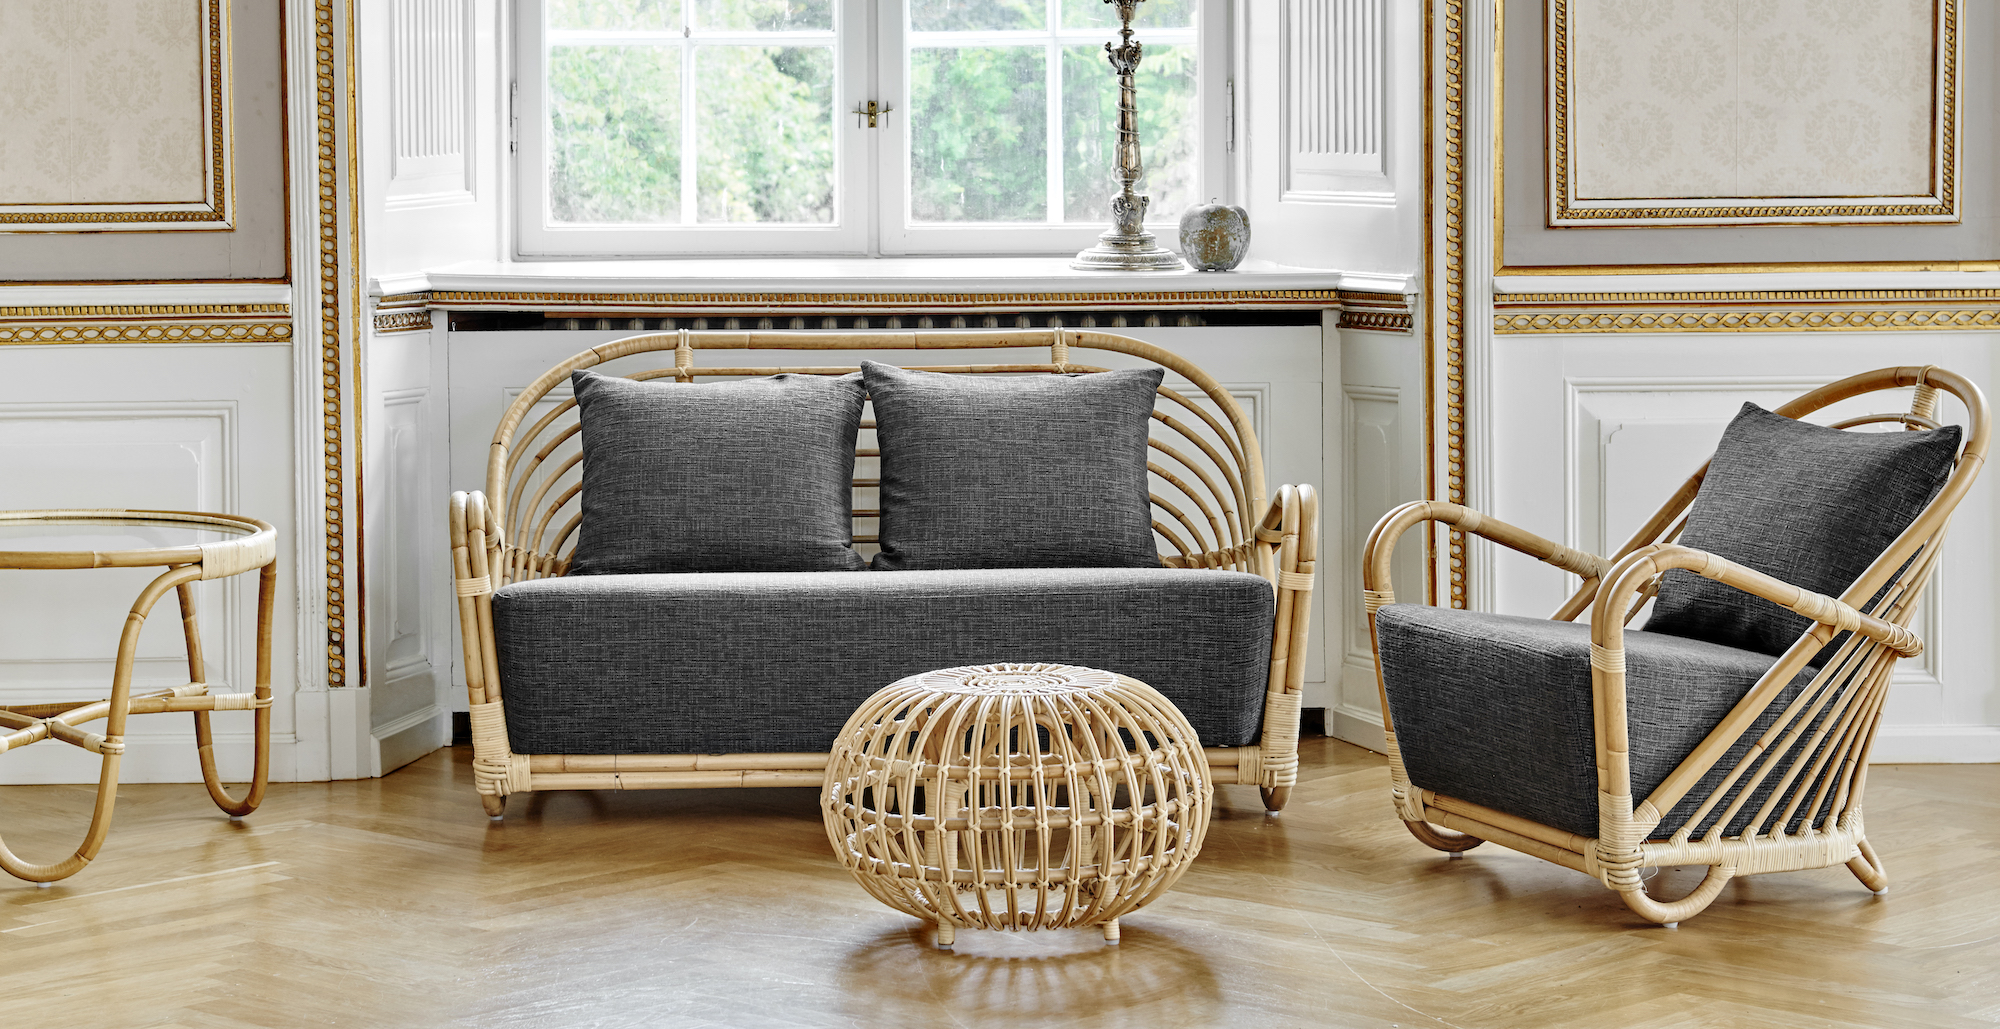 Alu Design Vaison La Romaine sika design usa i handmade wicker, rattan, & cafe furniture